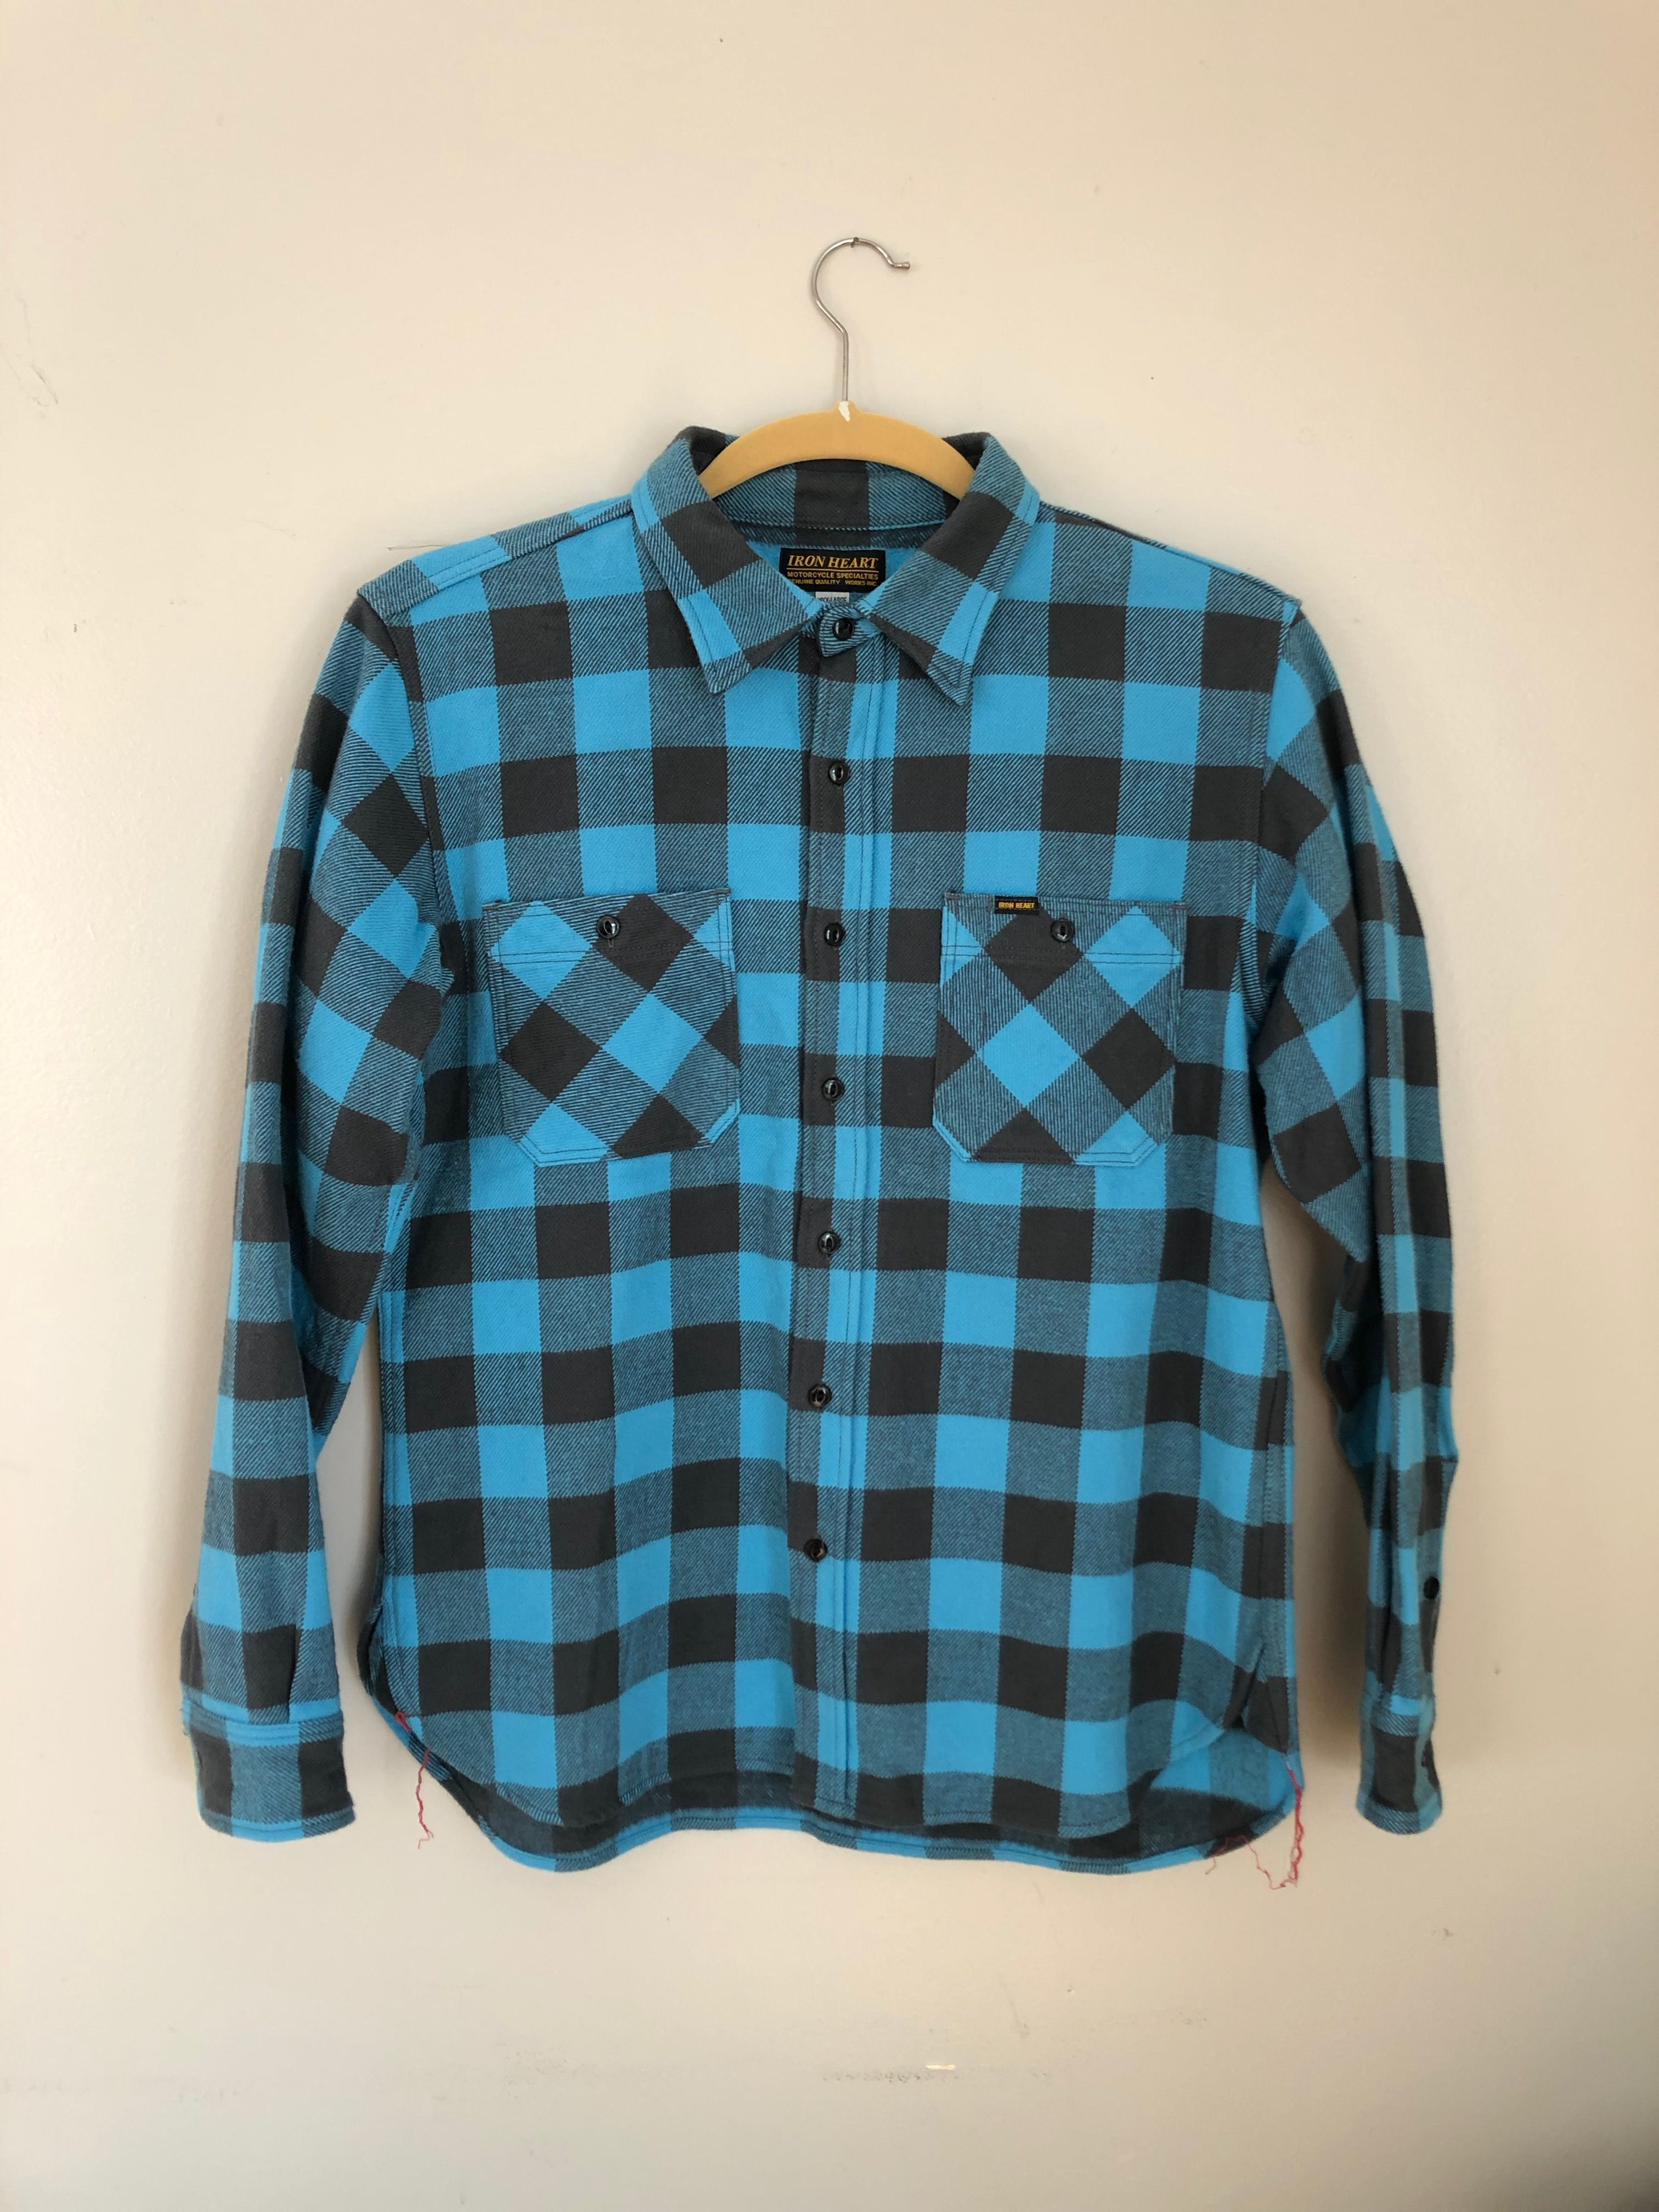 Iron Heart IHSH-102-TG (Turquoise/Grey Ultra Heavy Buffalo Check Work Shirt)